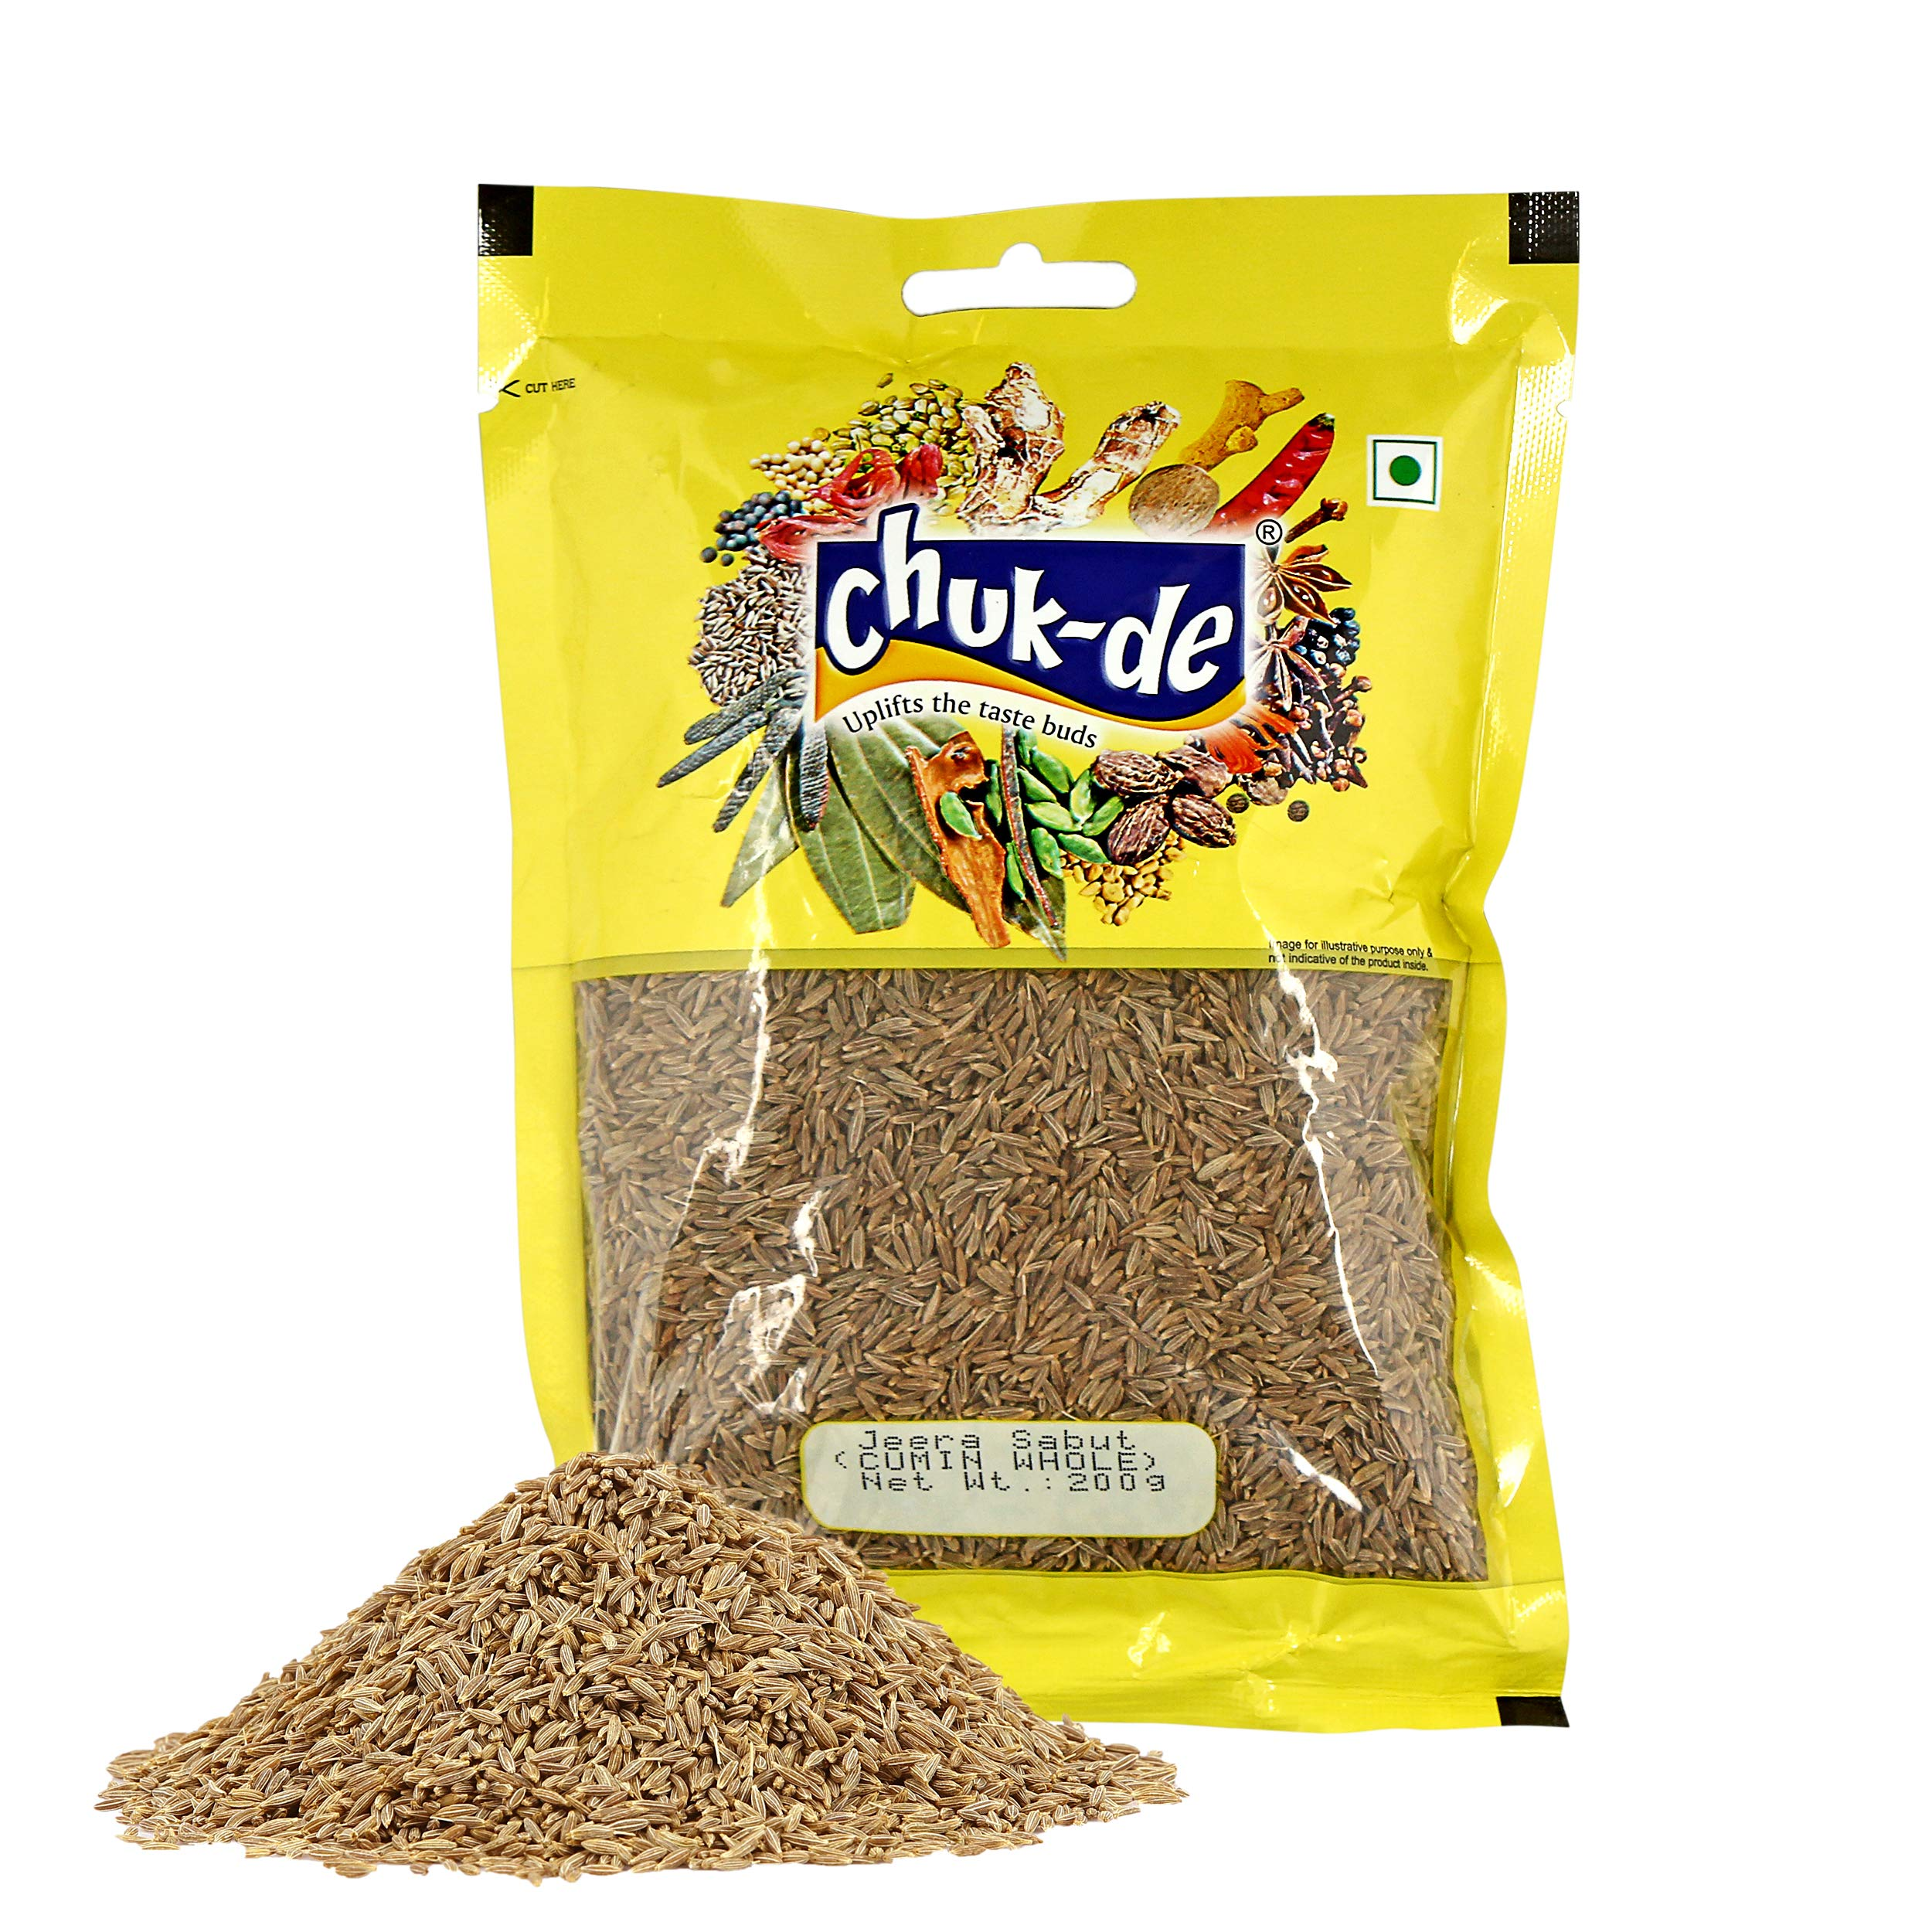 Chukde Spices Jeera Sabut/Whole (Cumin Seed) 200g